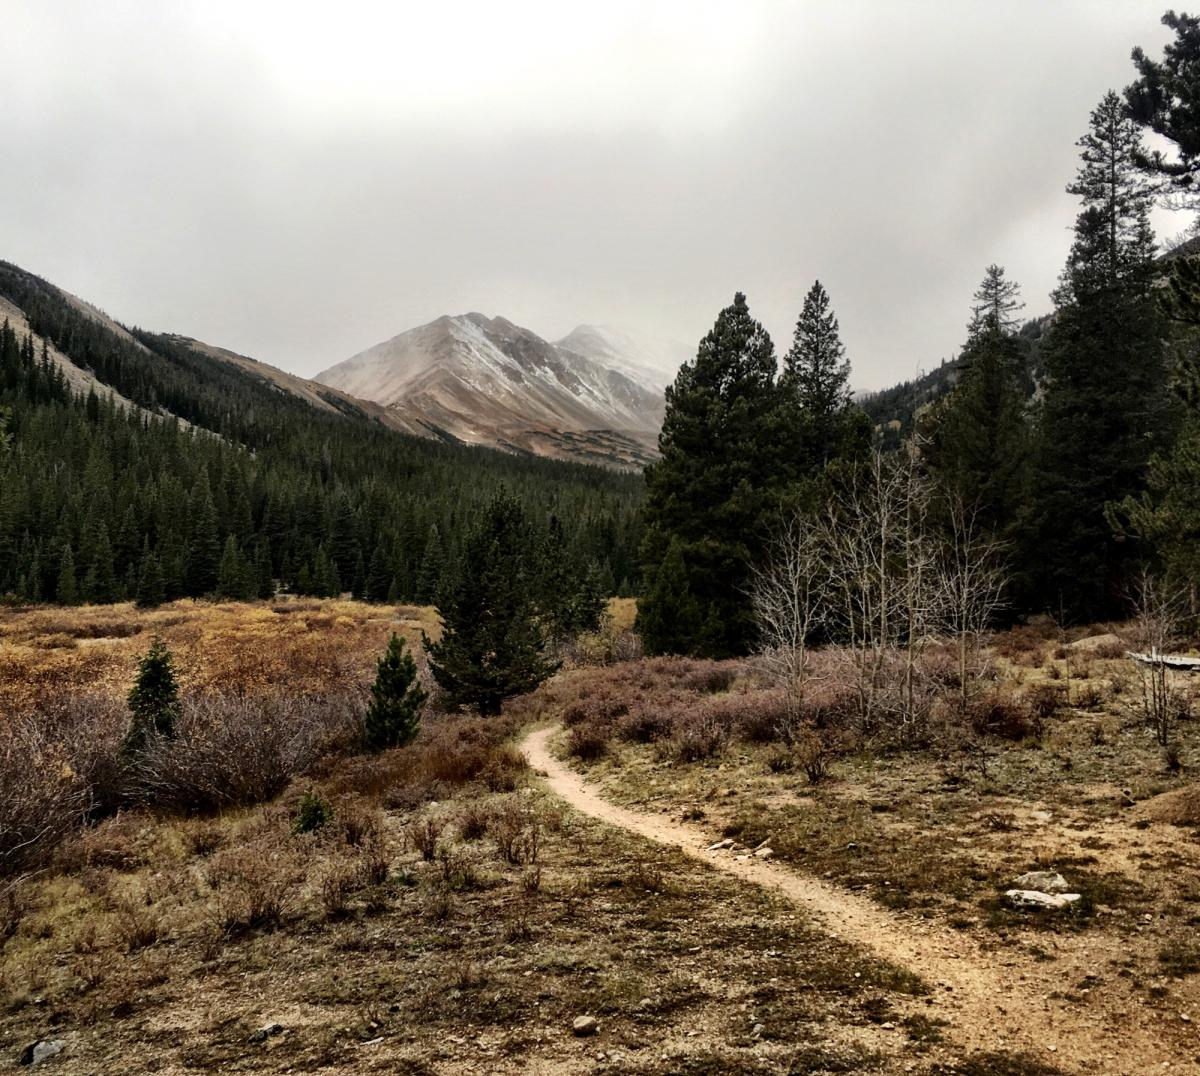 Colorado Trail: North Cottonwood to Collegiate Peaks Wilderness